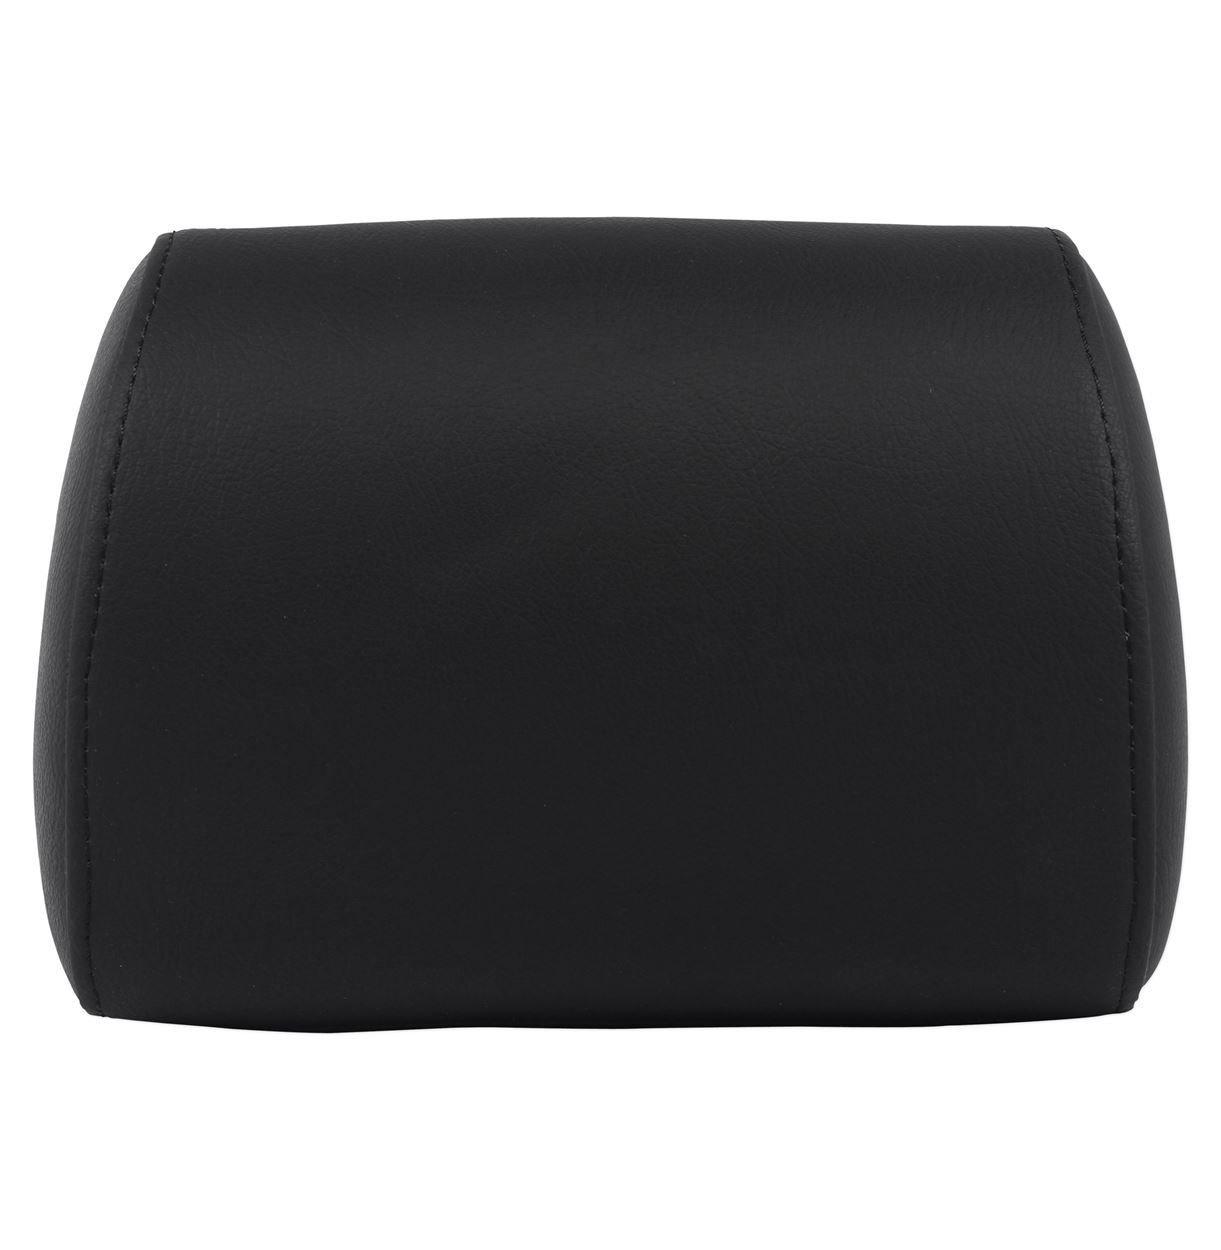 "Pair Rockville RHP7-BK 7"" Black TFT-LCD Car Headrest Monitors+2 Wireless Headset by Rockville (Image #3)"